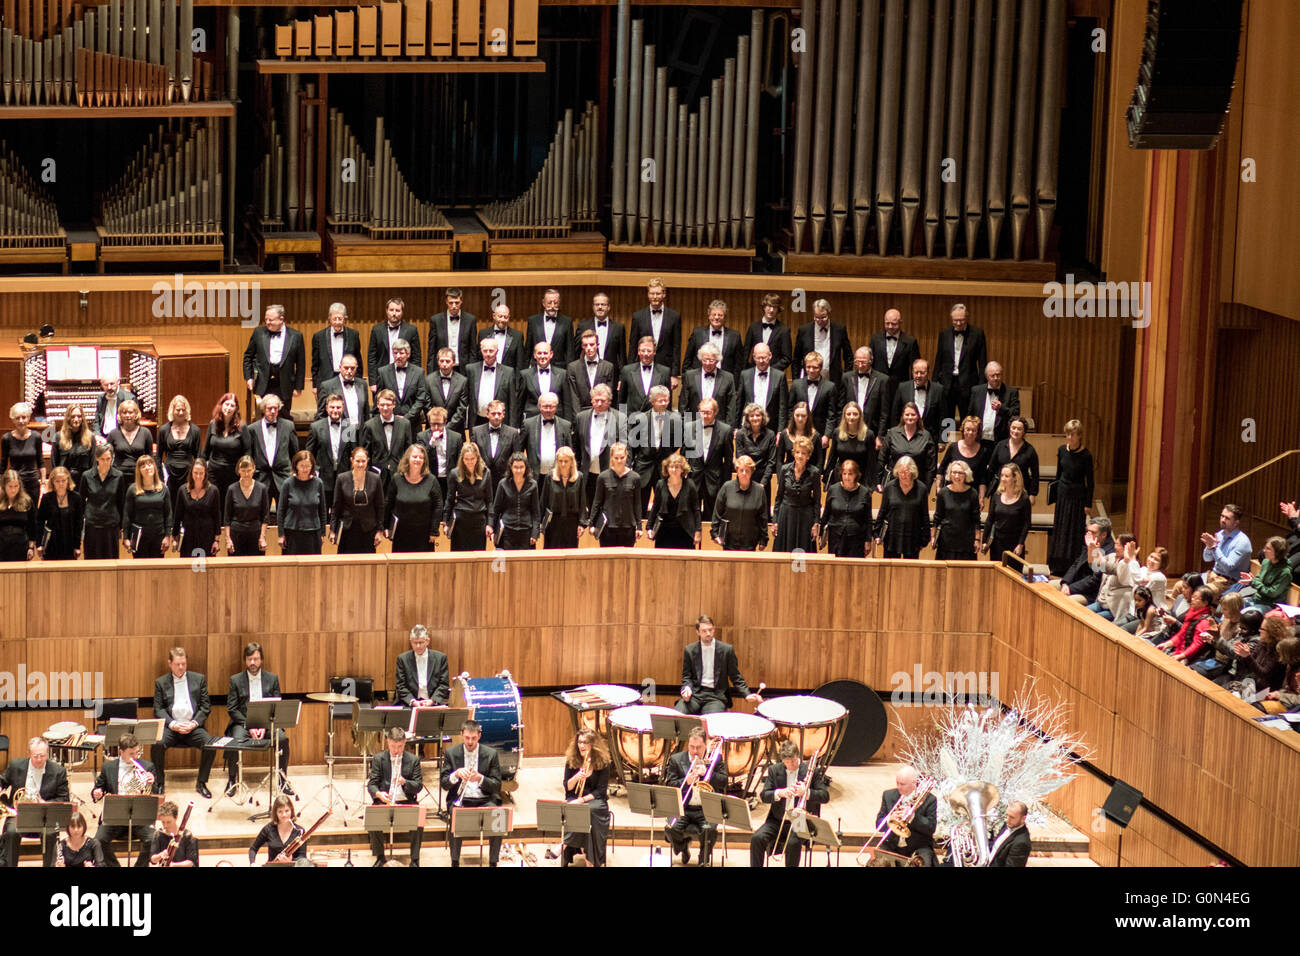 Choir Orchestra Handel's Messiah Royal Festival Hall - Stock Image